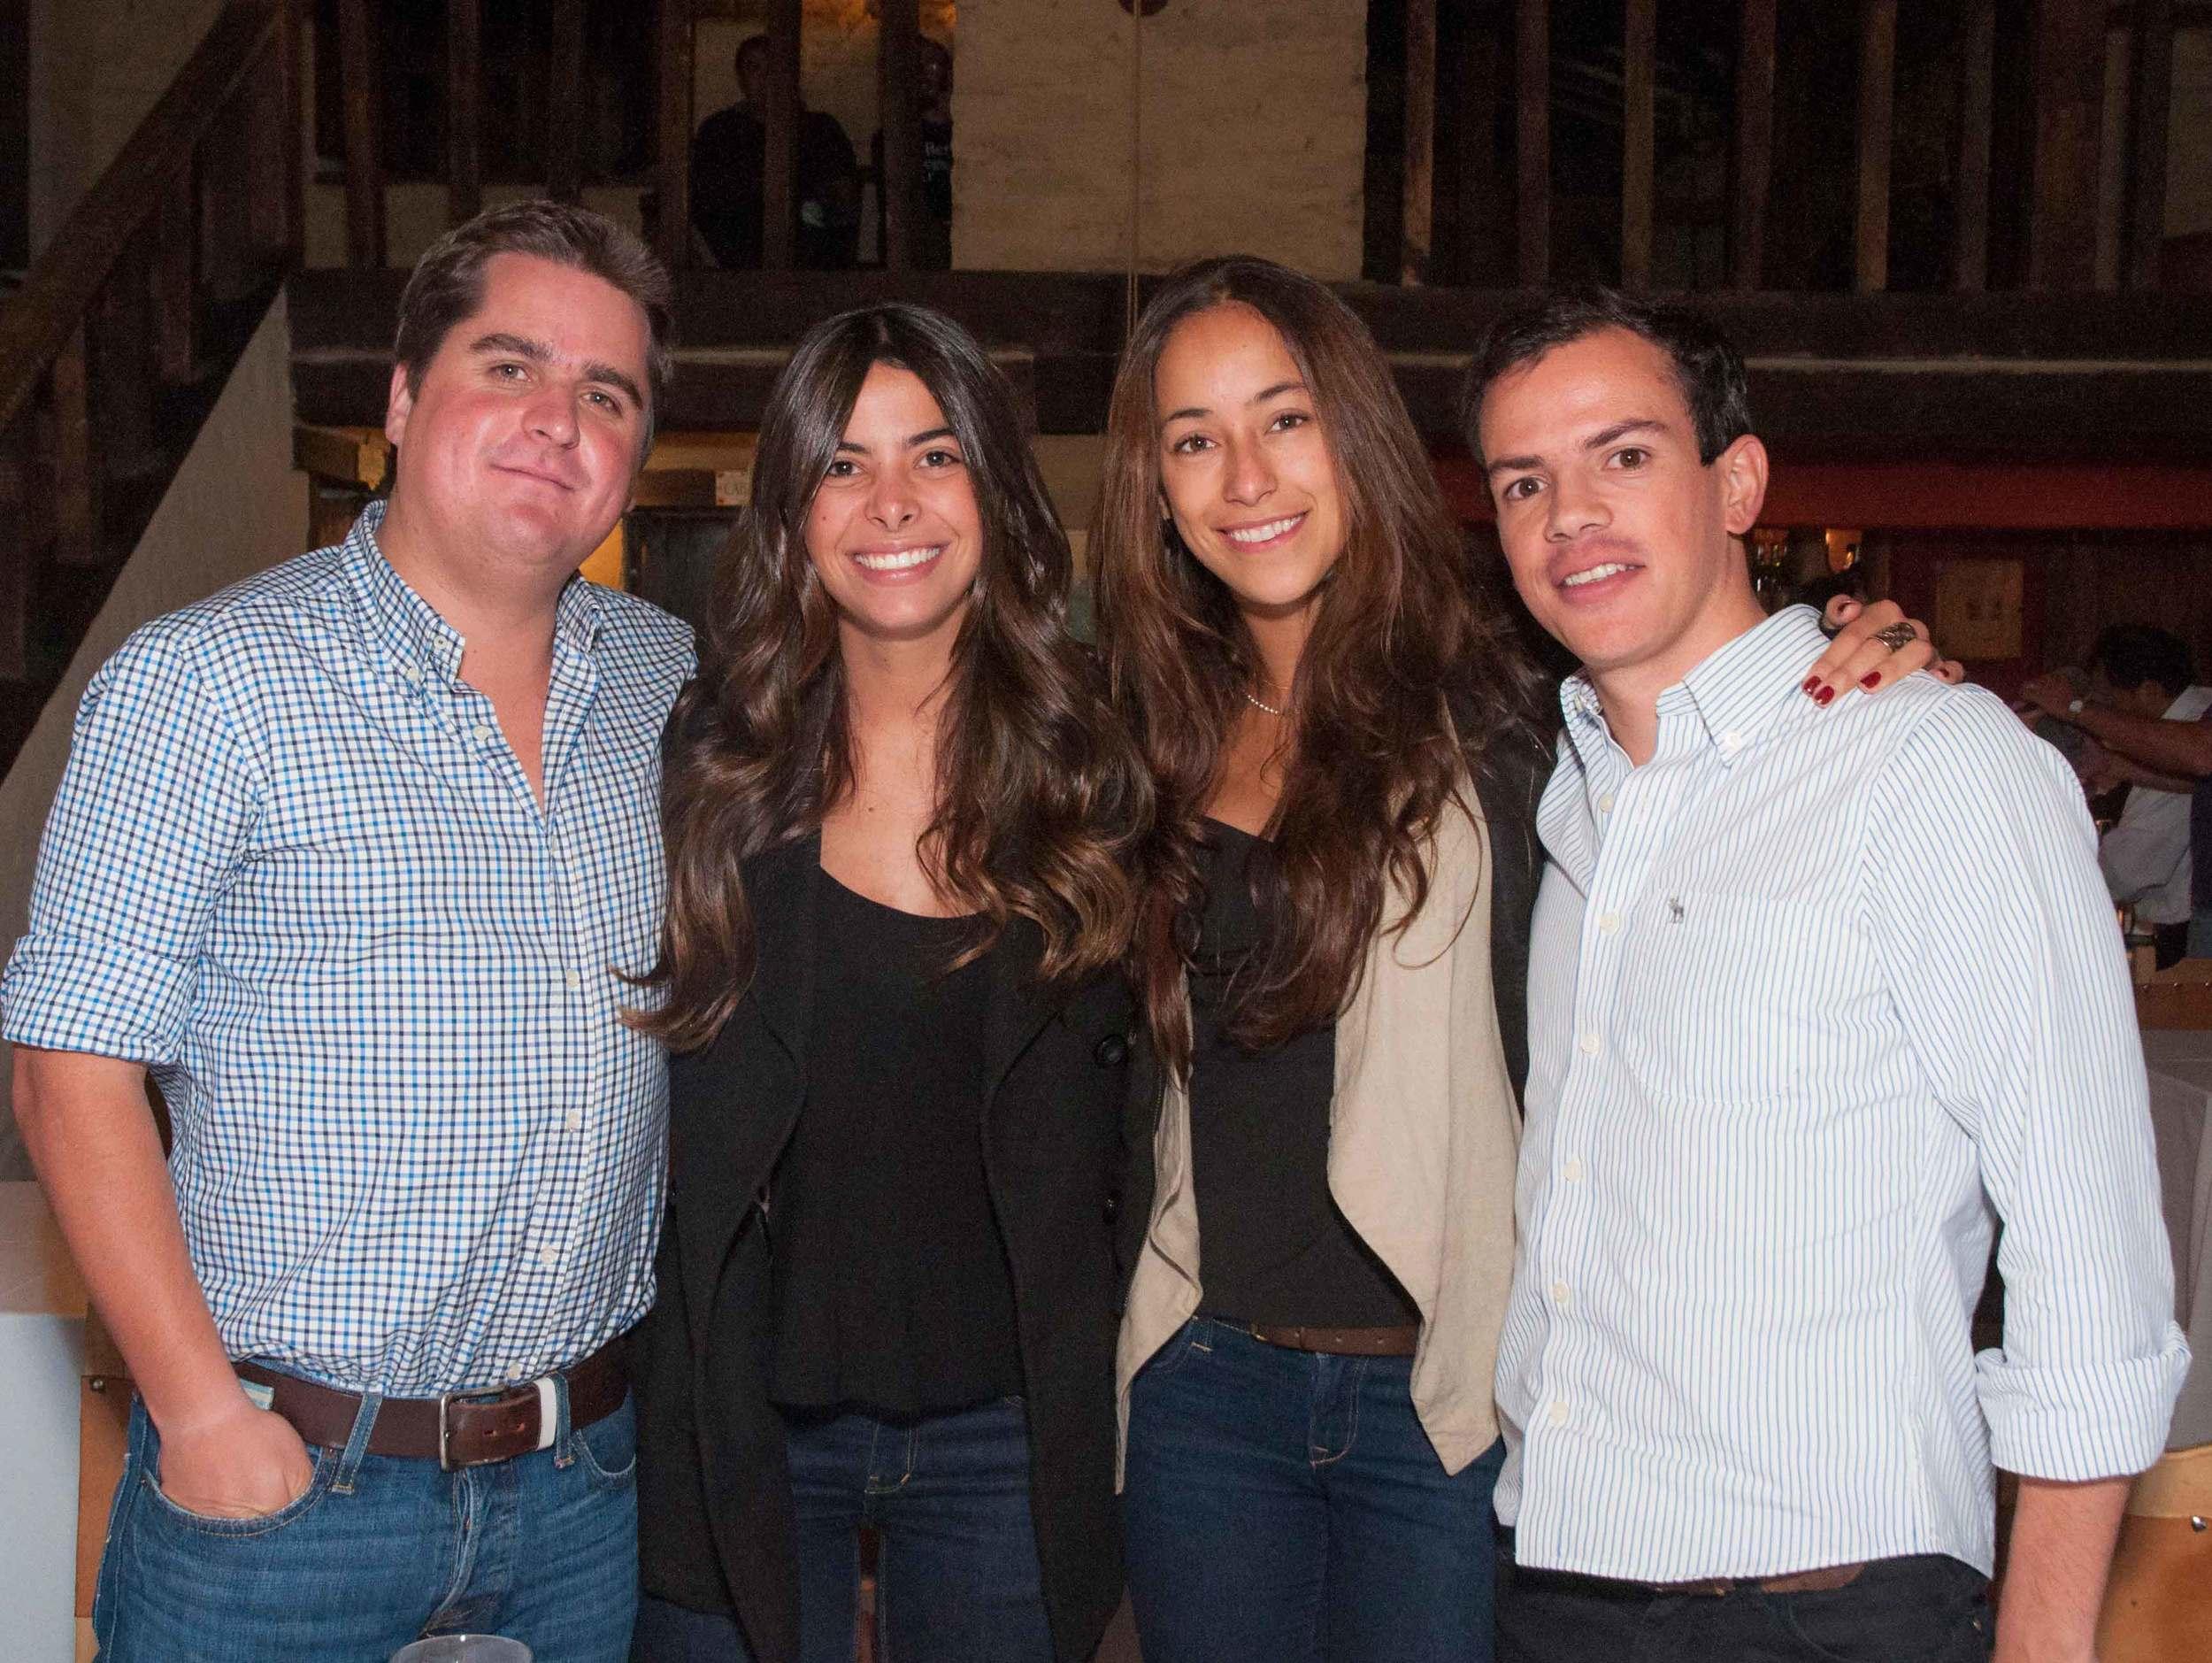 Juan Andrés Brandon, Paula Vivas, Cristina Pineda y Alejandro Monsalve